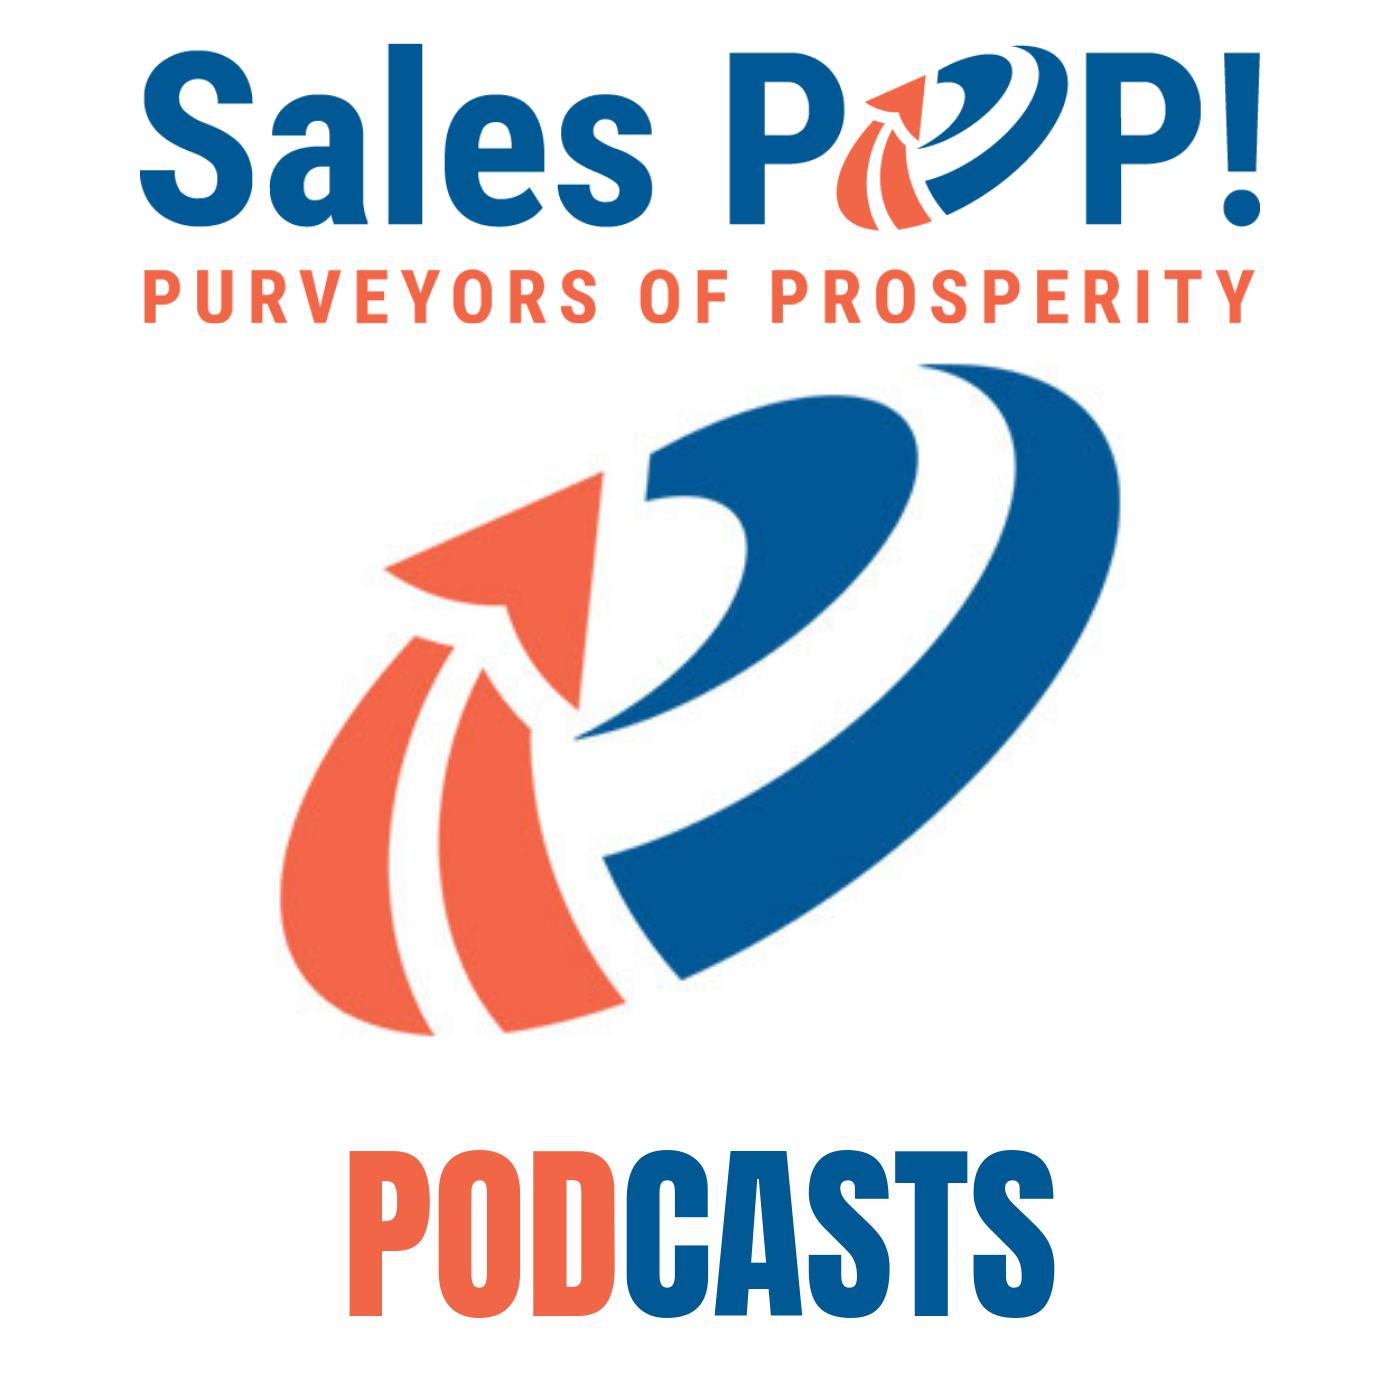 Sales POP! Podcasts | Himalaya